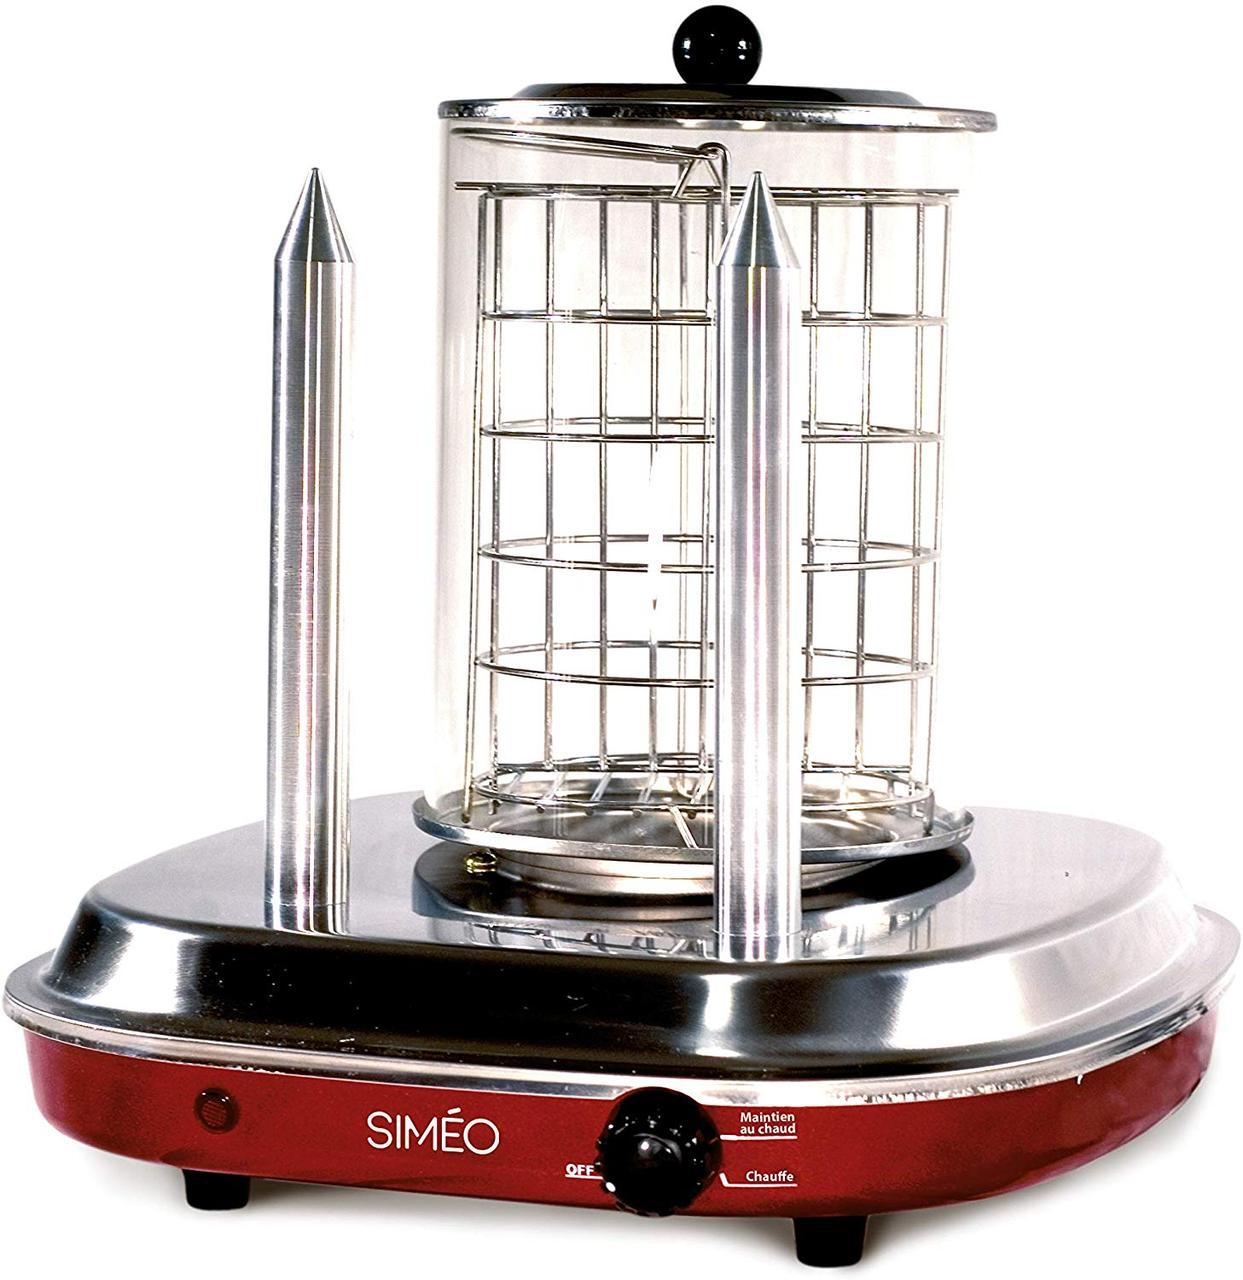 Siméo FC465 Аппарат для хот-догов, 450 Вт